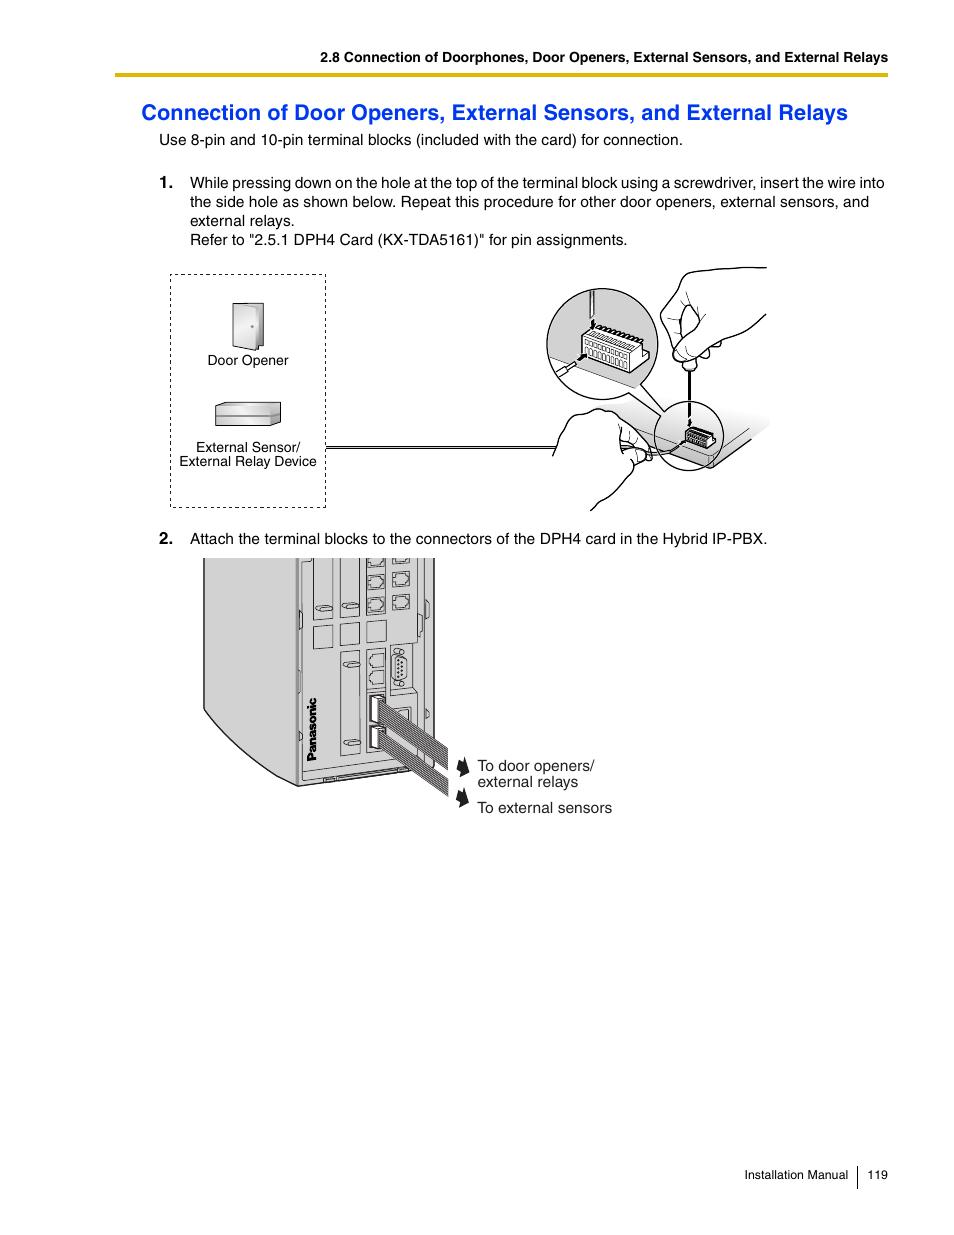 Panasonic Hybrid Ip Pbx Kx Tda50 User Manual Page 119 158 Wiring Diagram 155